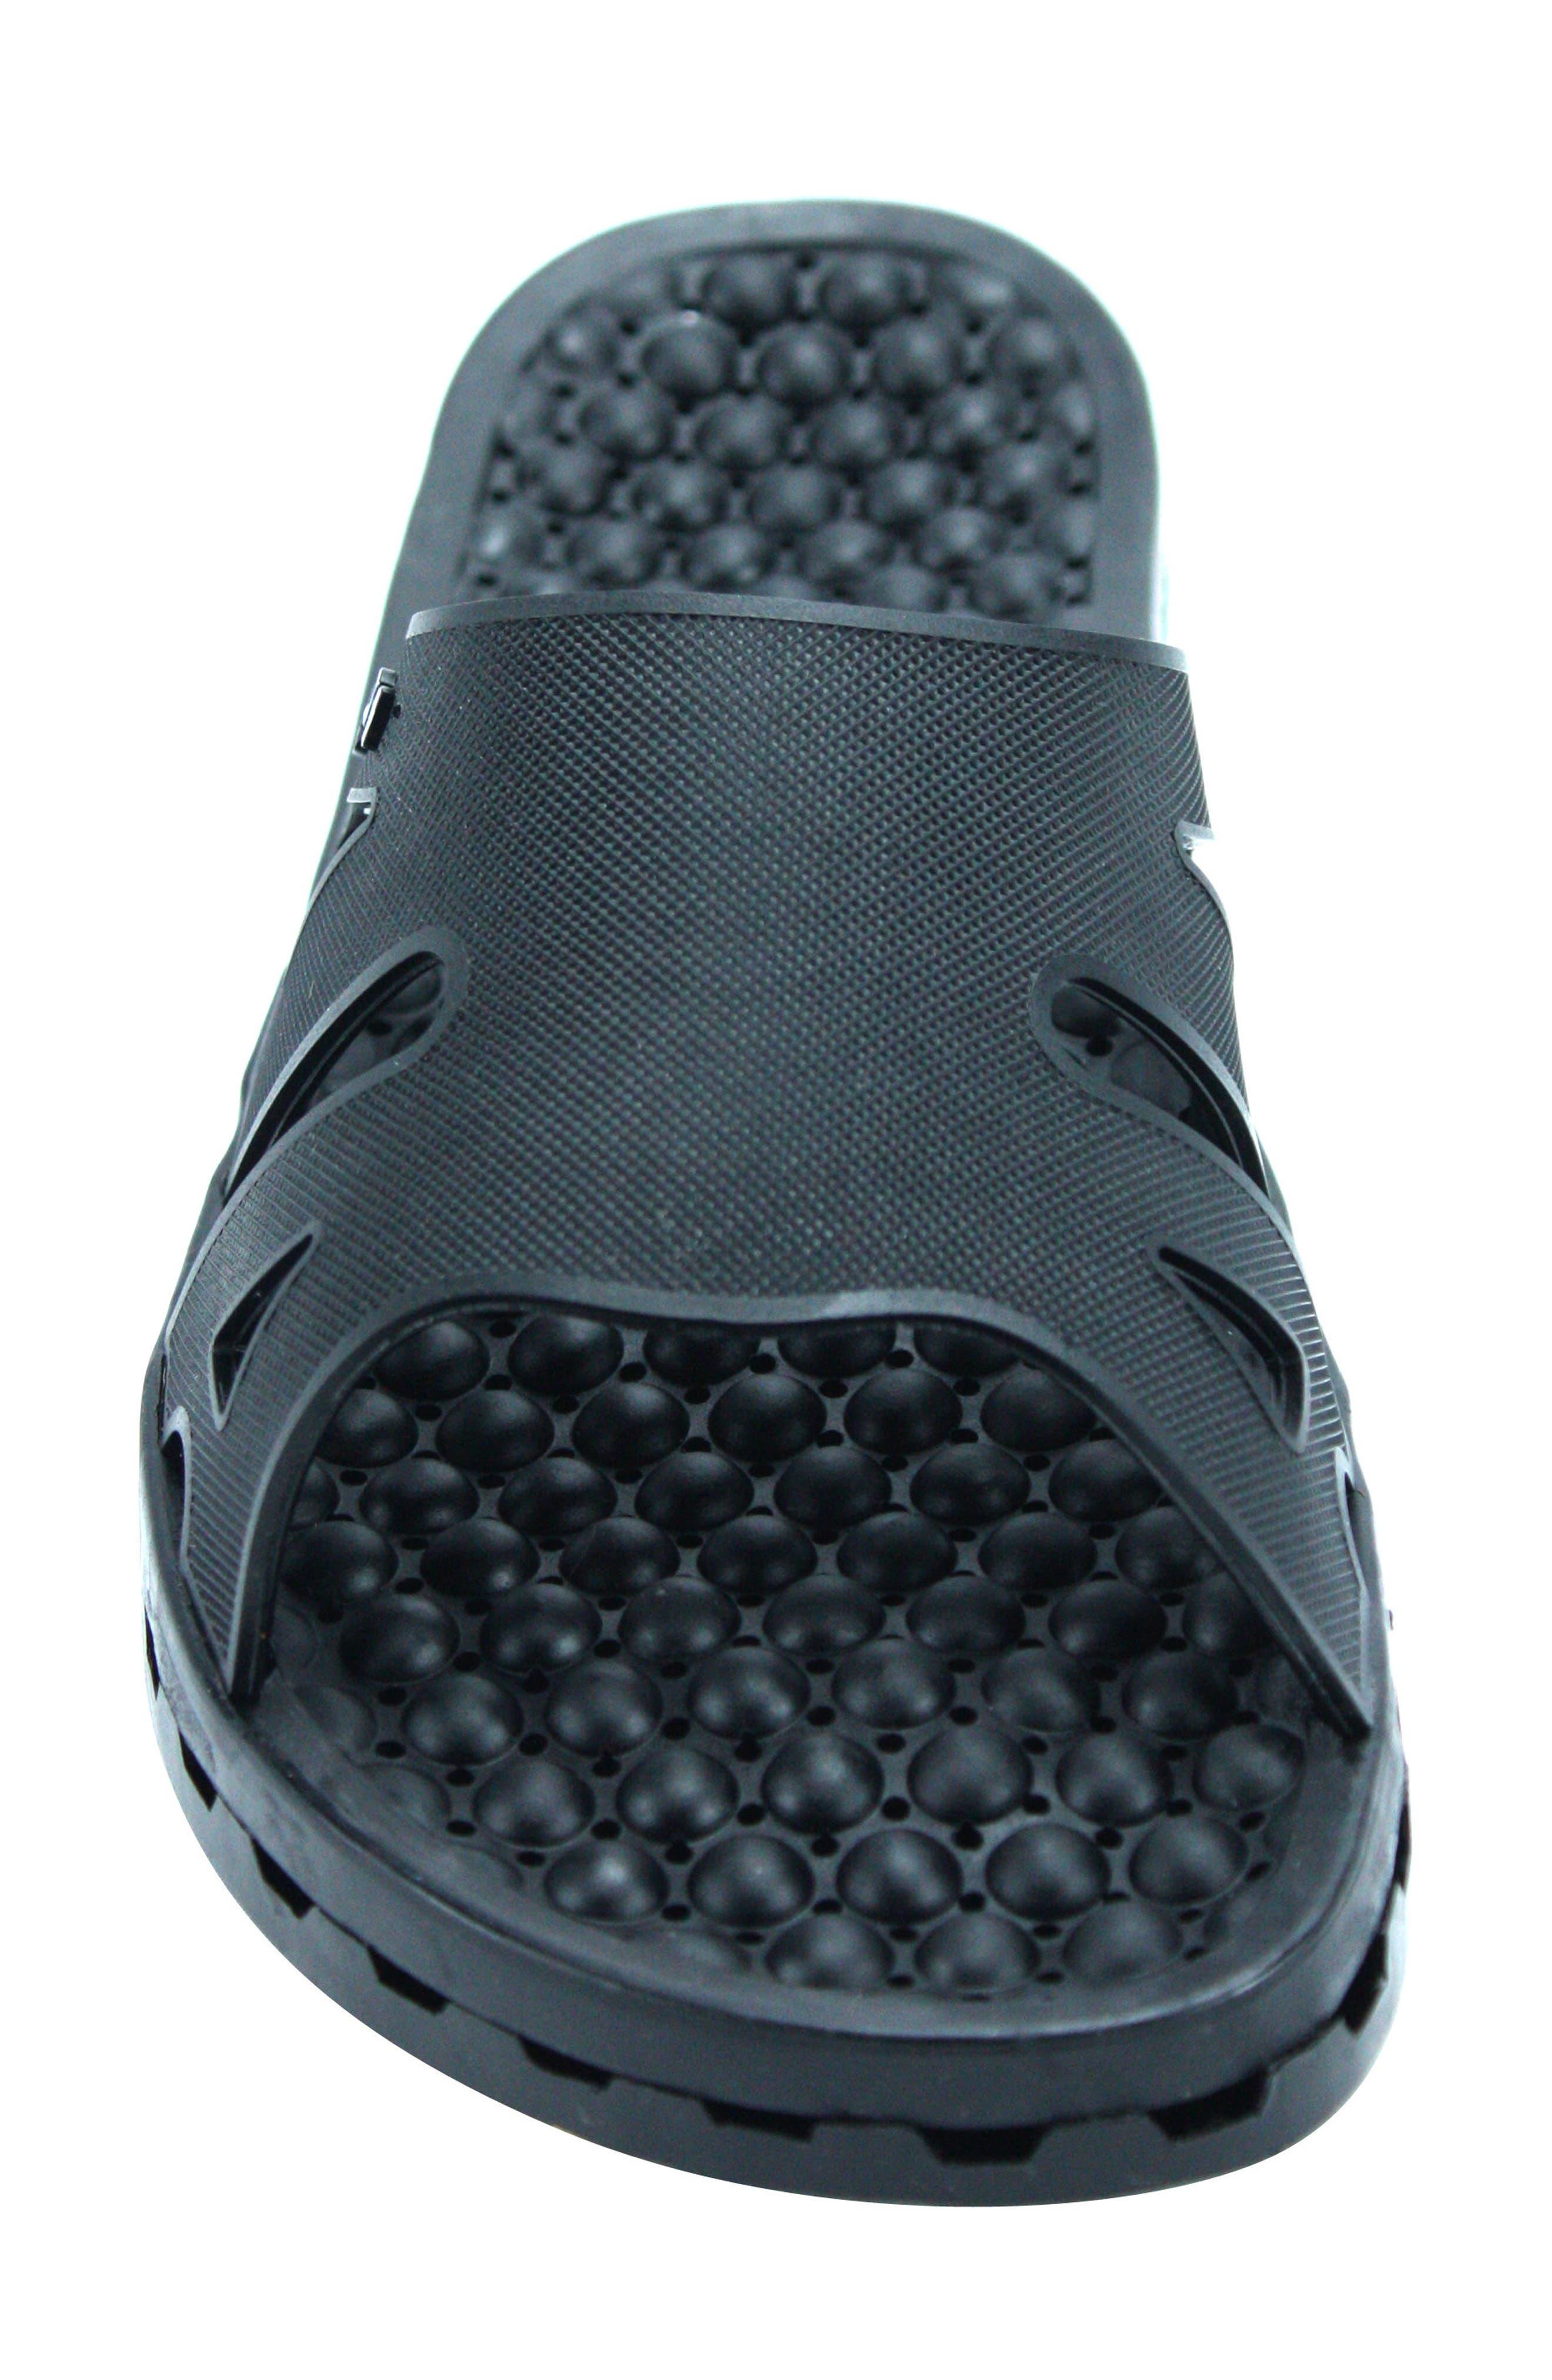 Regatta Ice Slide Sandal,                             Alternate thumbnail 4, color,                             SOLID BLACK